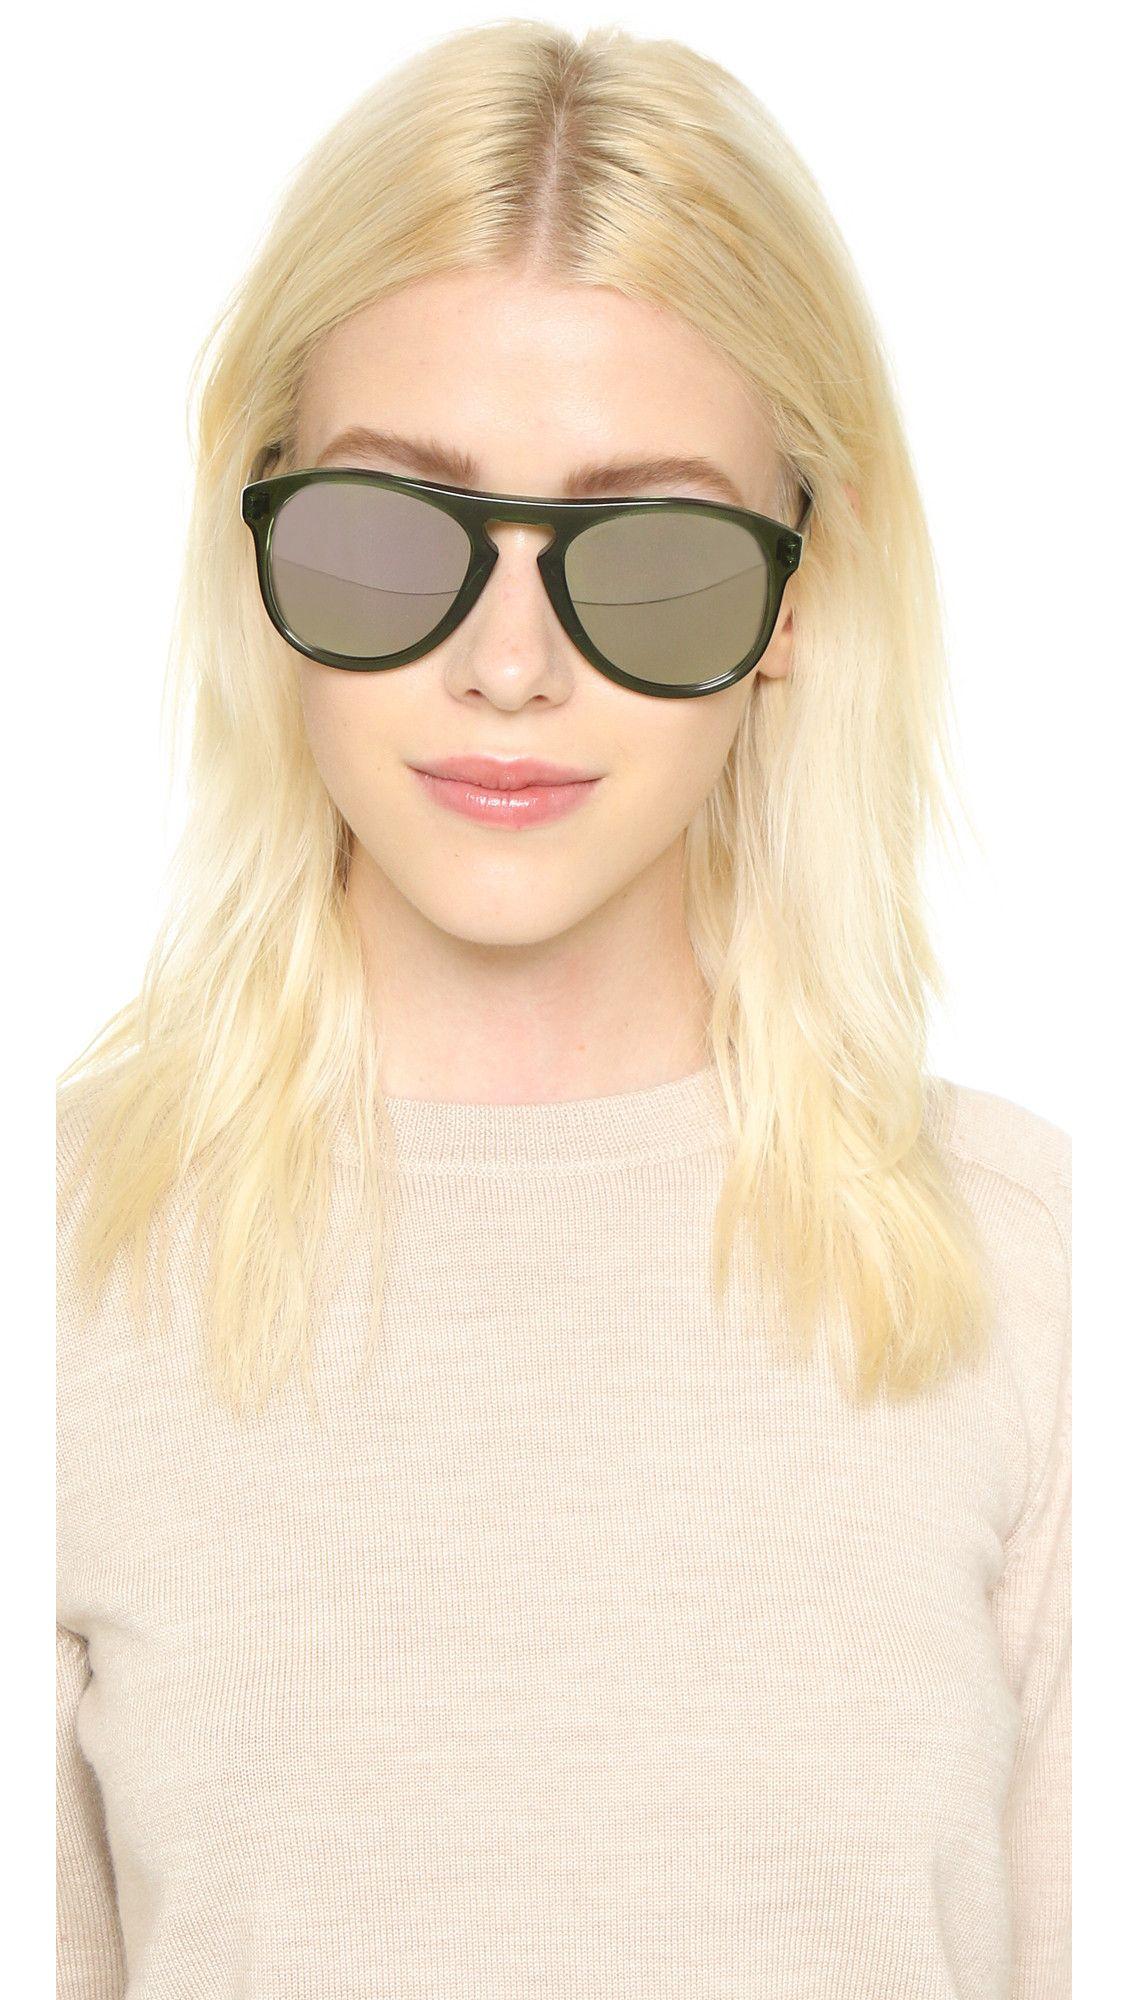 29aeec54eb 16 Best Of Westward Leaning Sunglasses Suggestions -